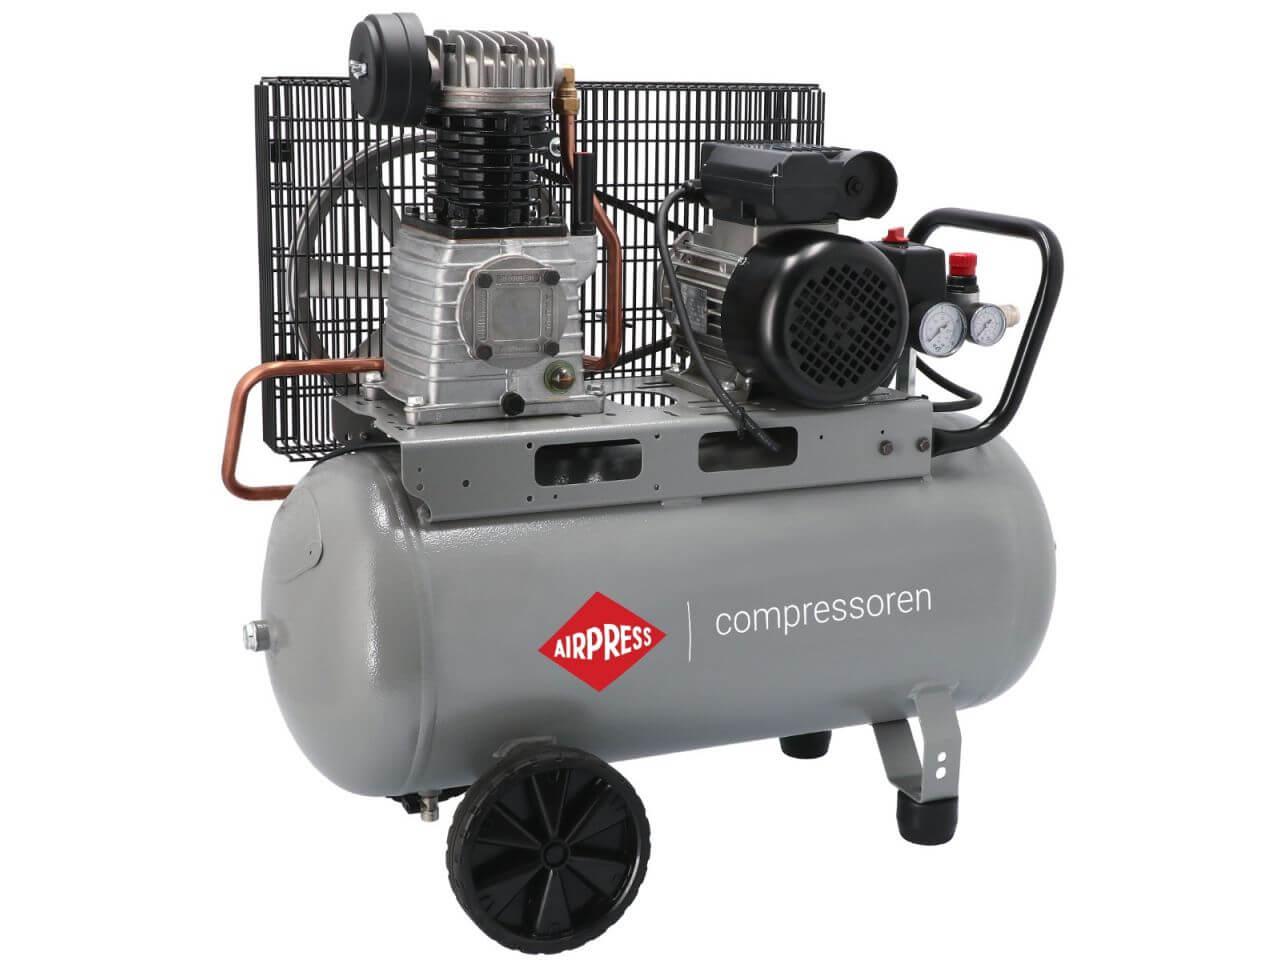 HL 310-50 Groene compressor met vliegwiel